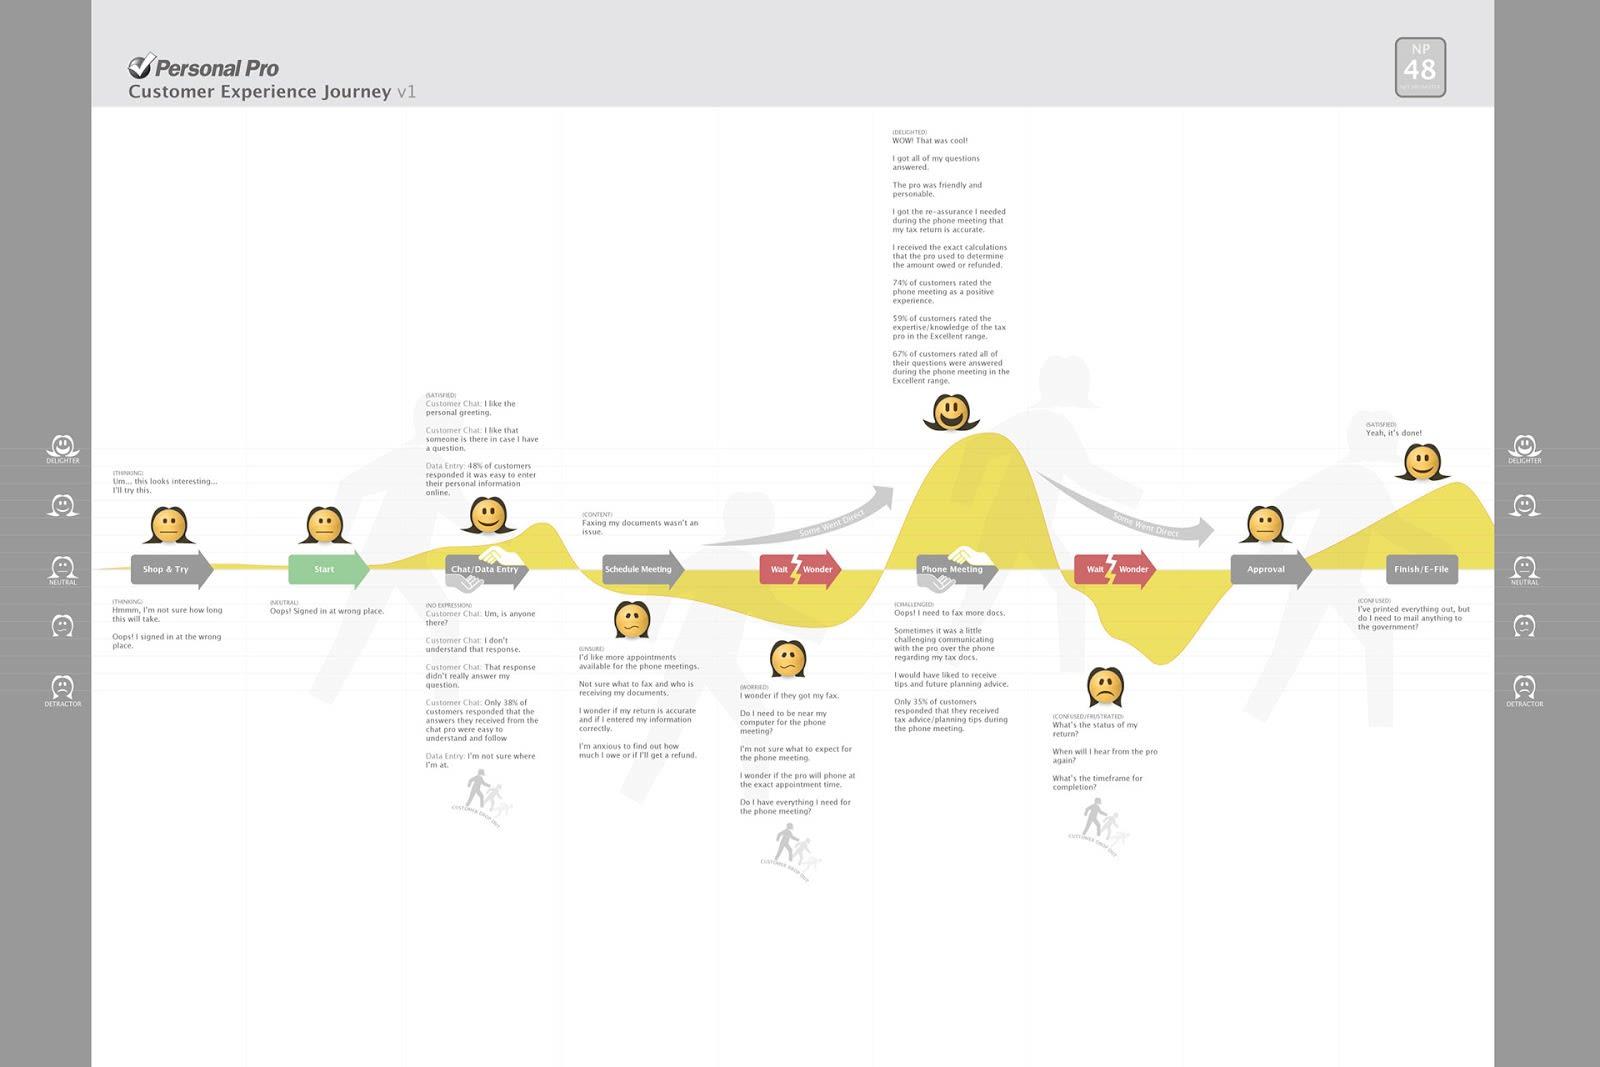 TurboTax Customer Journey Map